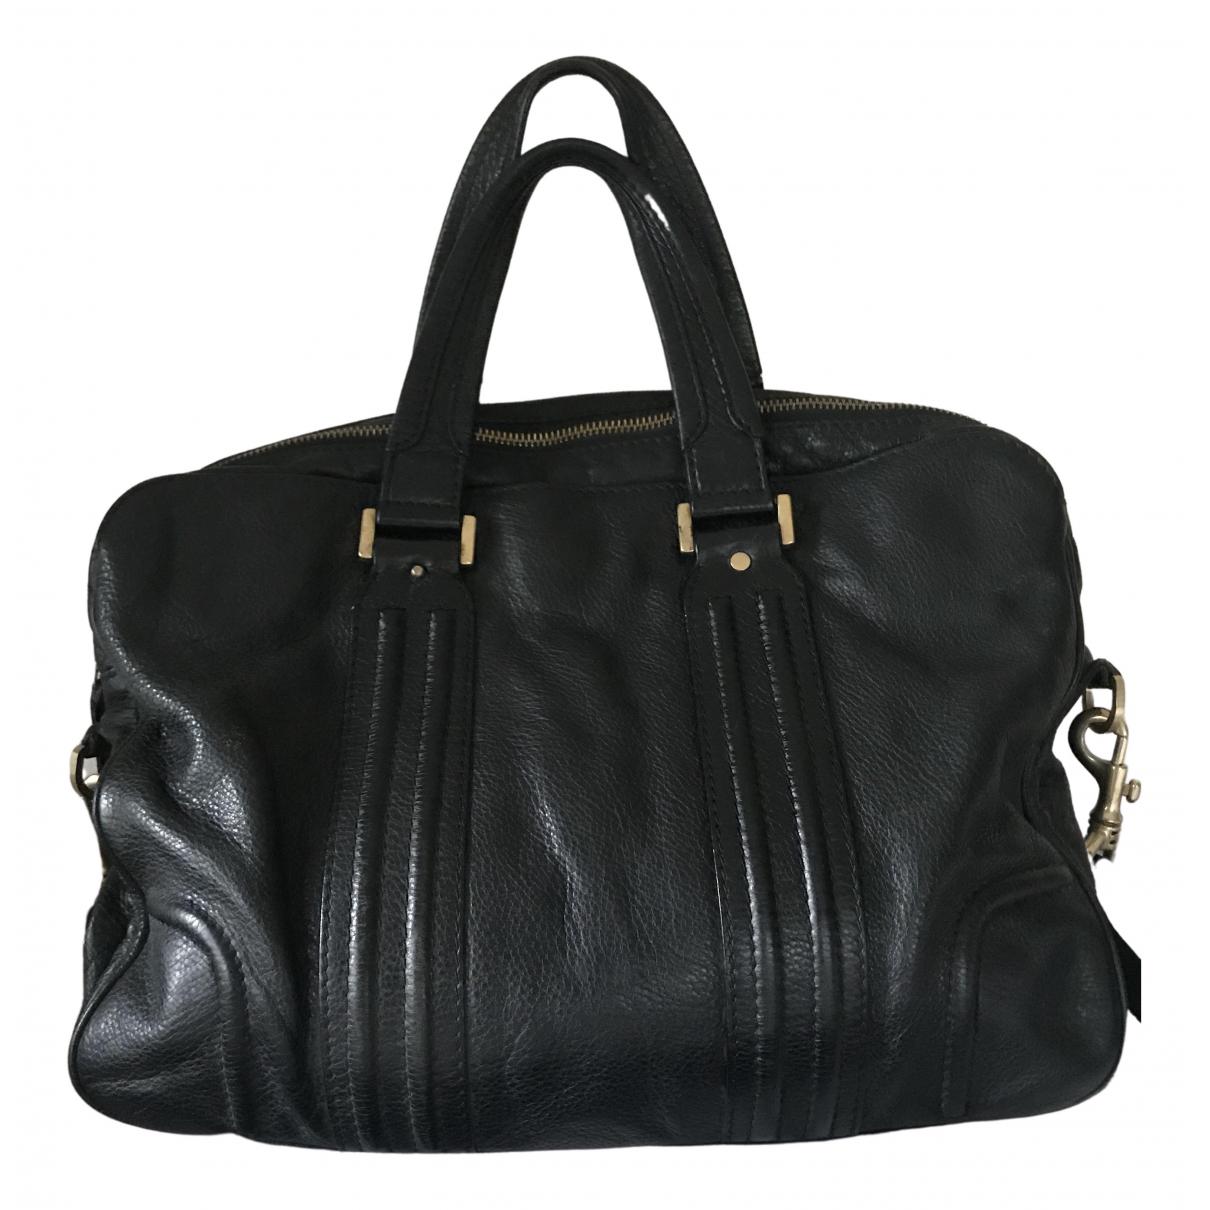 Mcm \N Black Leather bag for Men \N